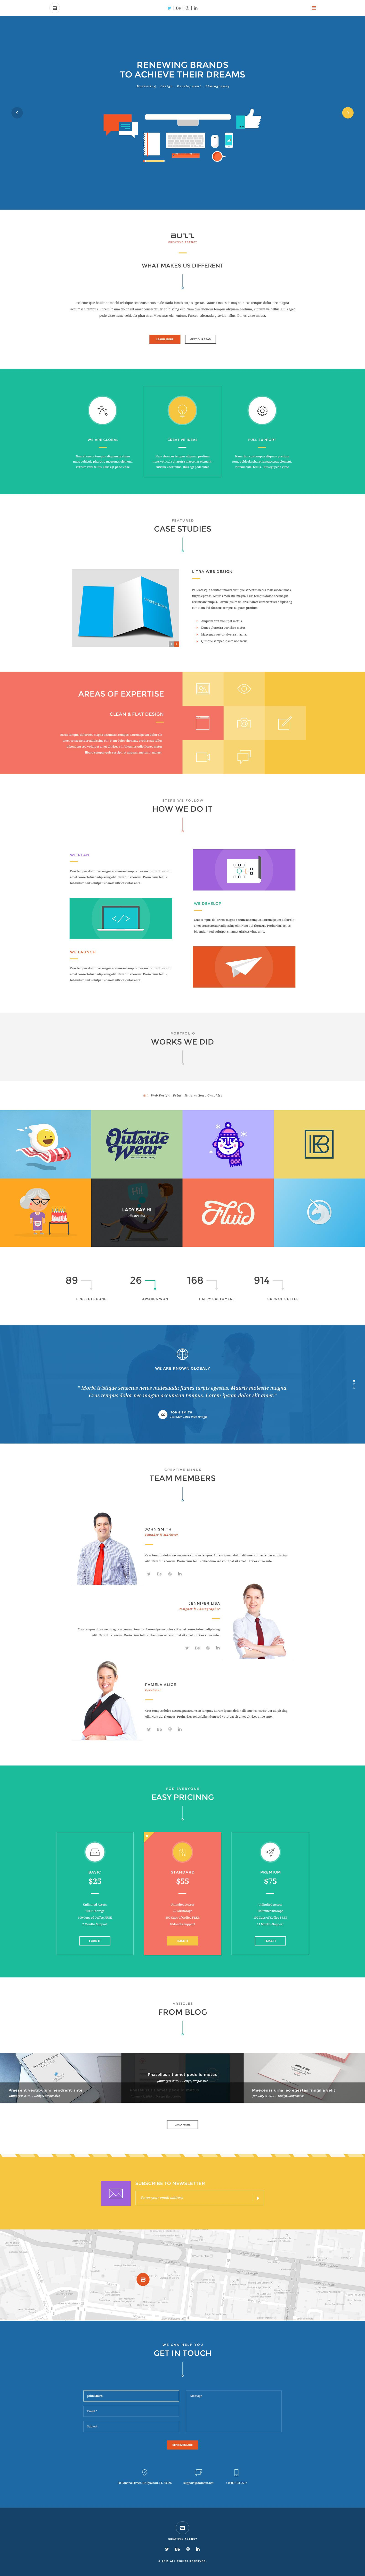 Buzz - Flat OnePage PSD Template - 1